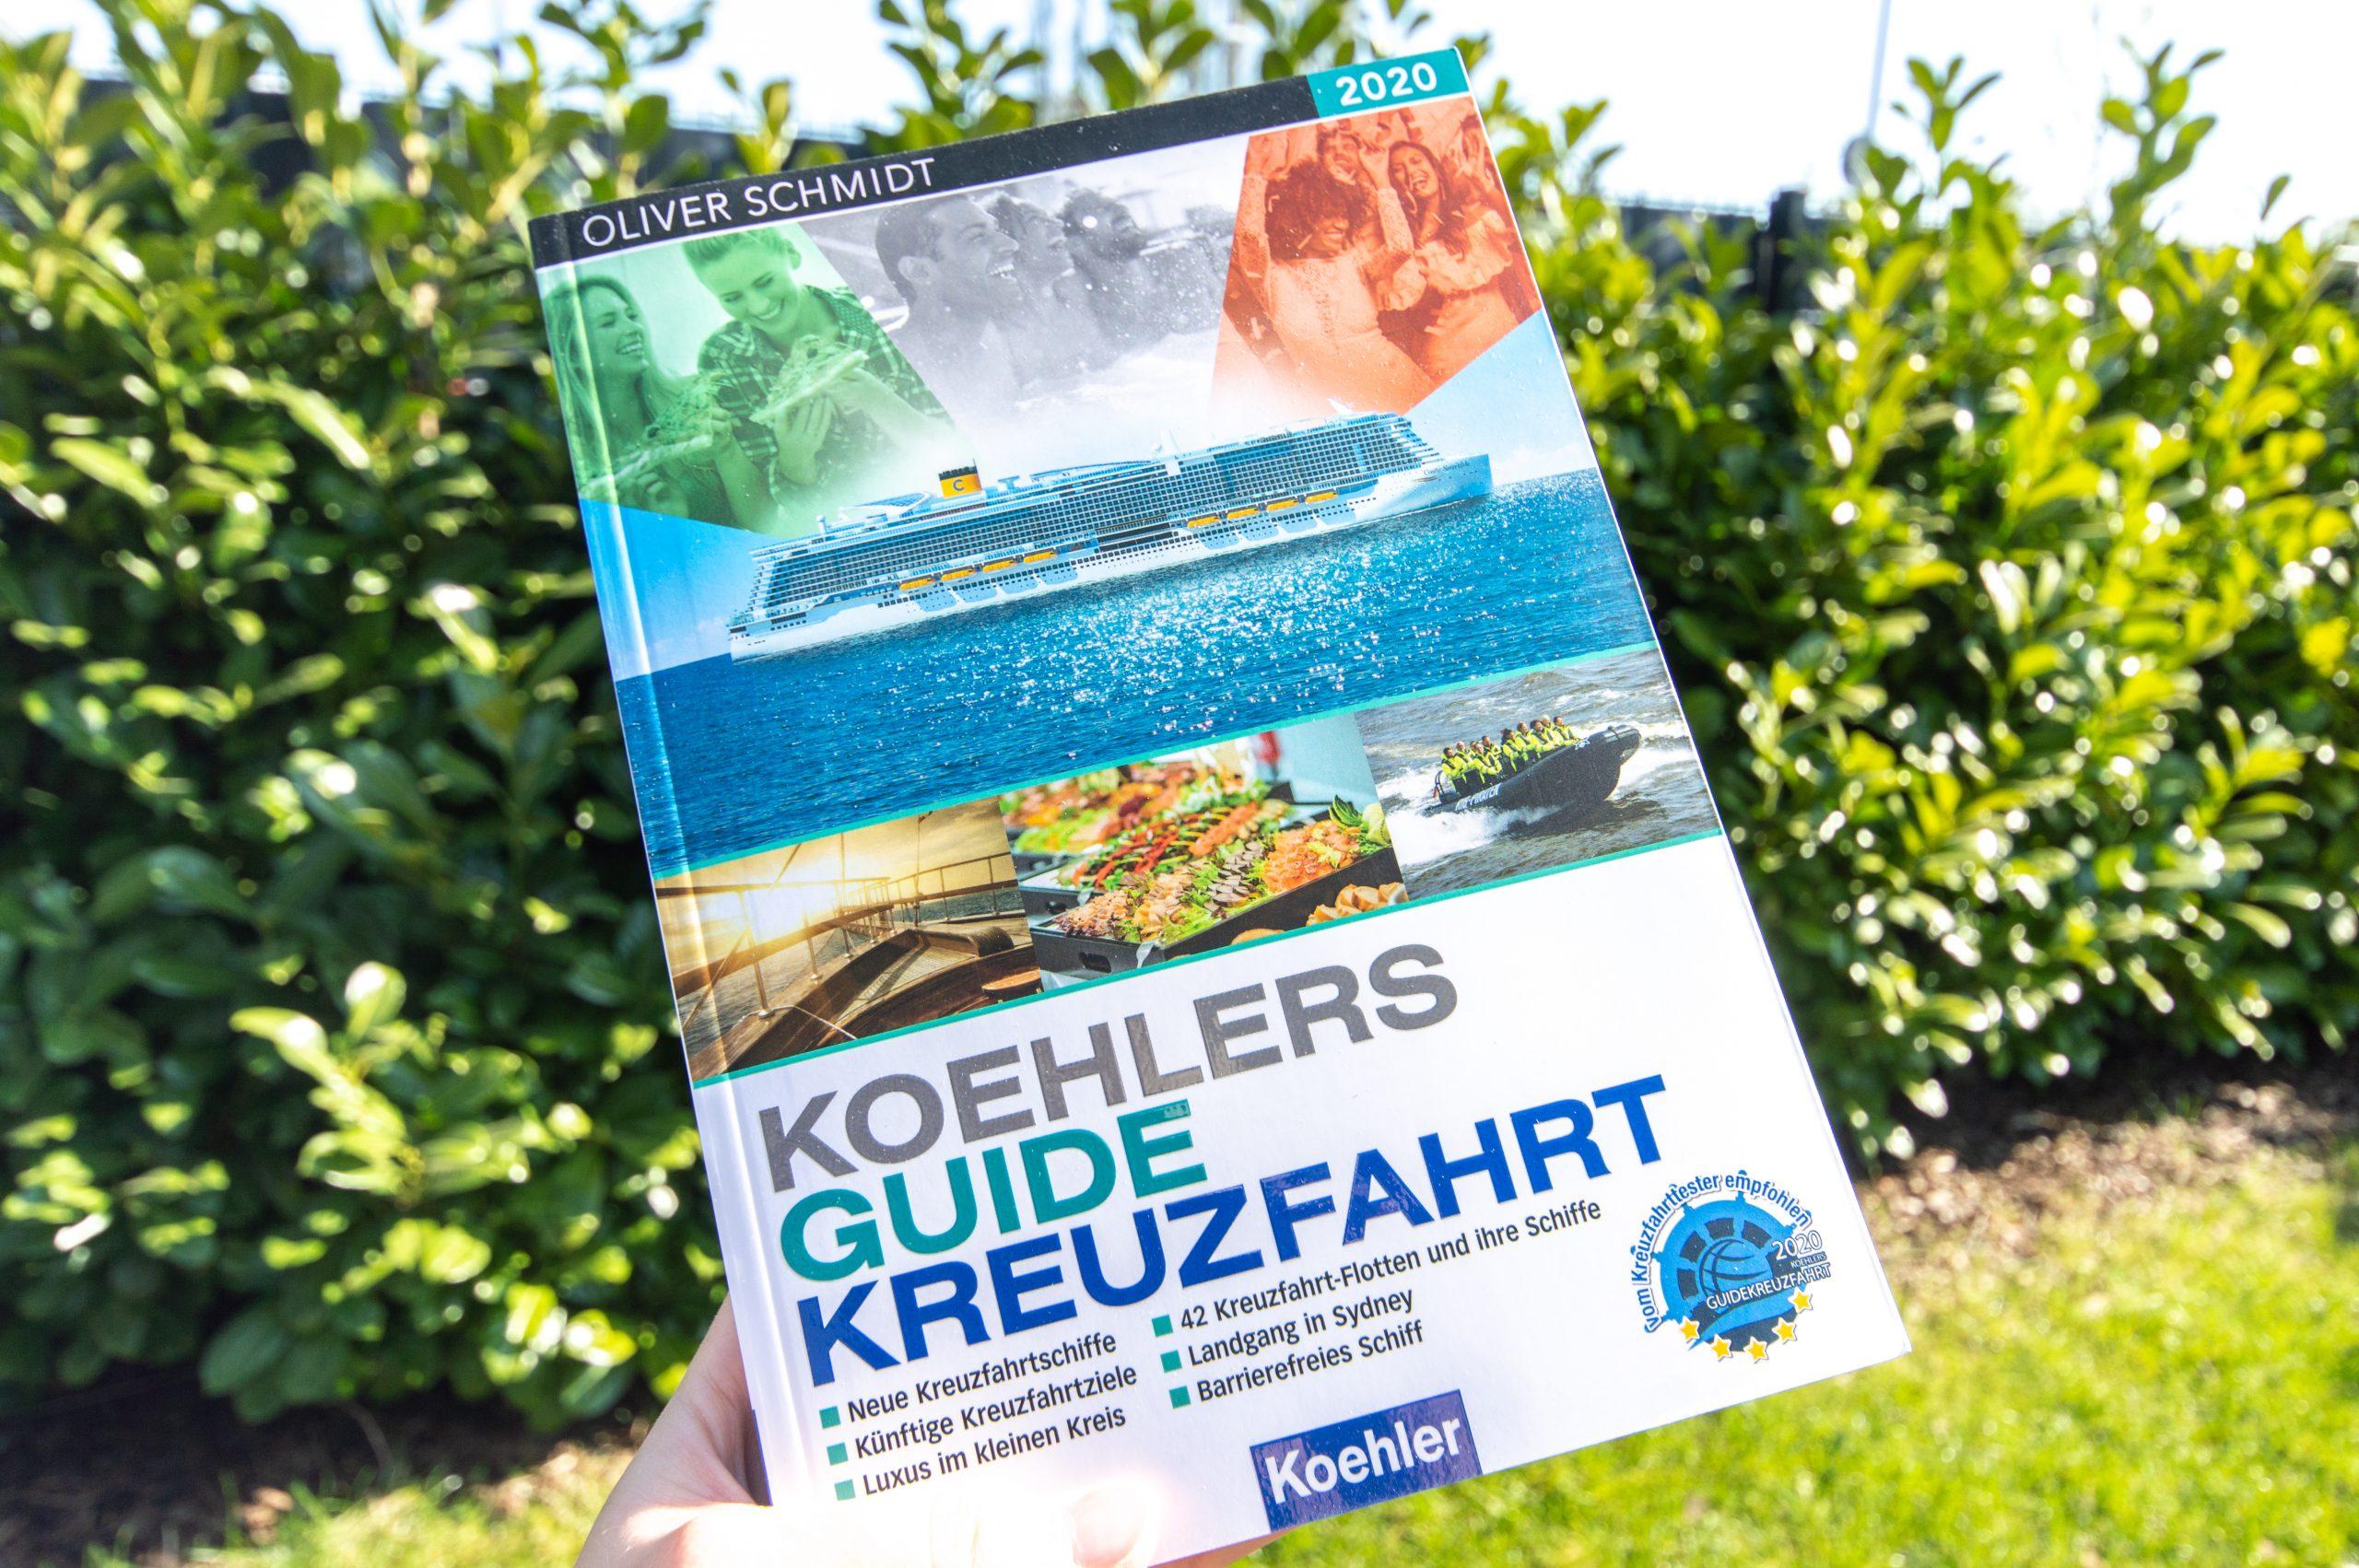 rp_Koehlers-Guide-Kreuzfahrt-2020-scaled.jpg